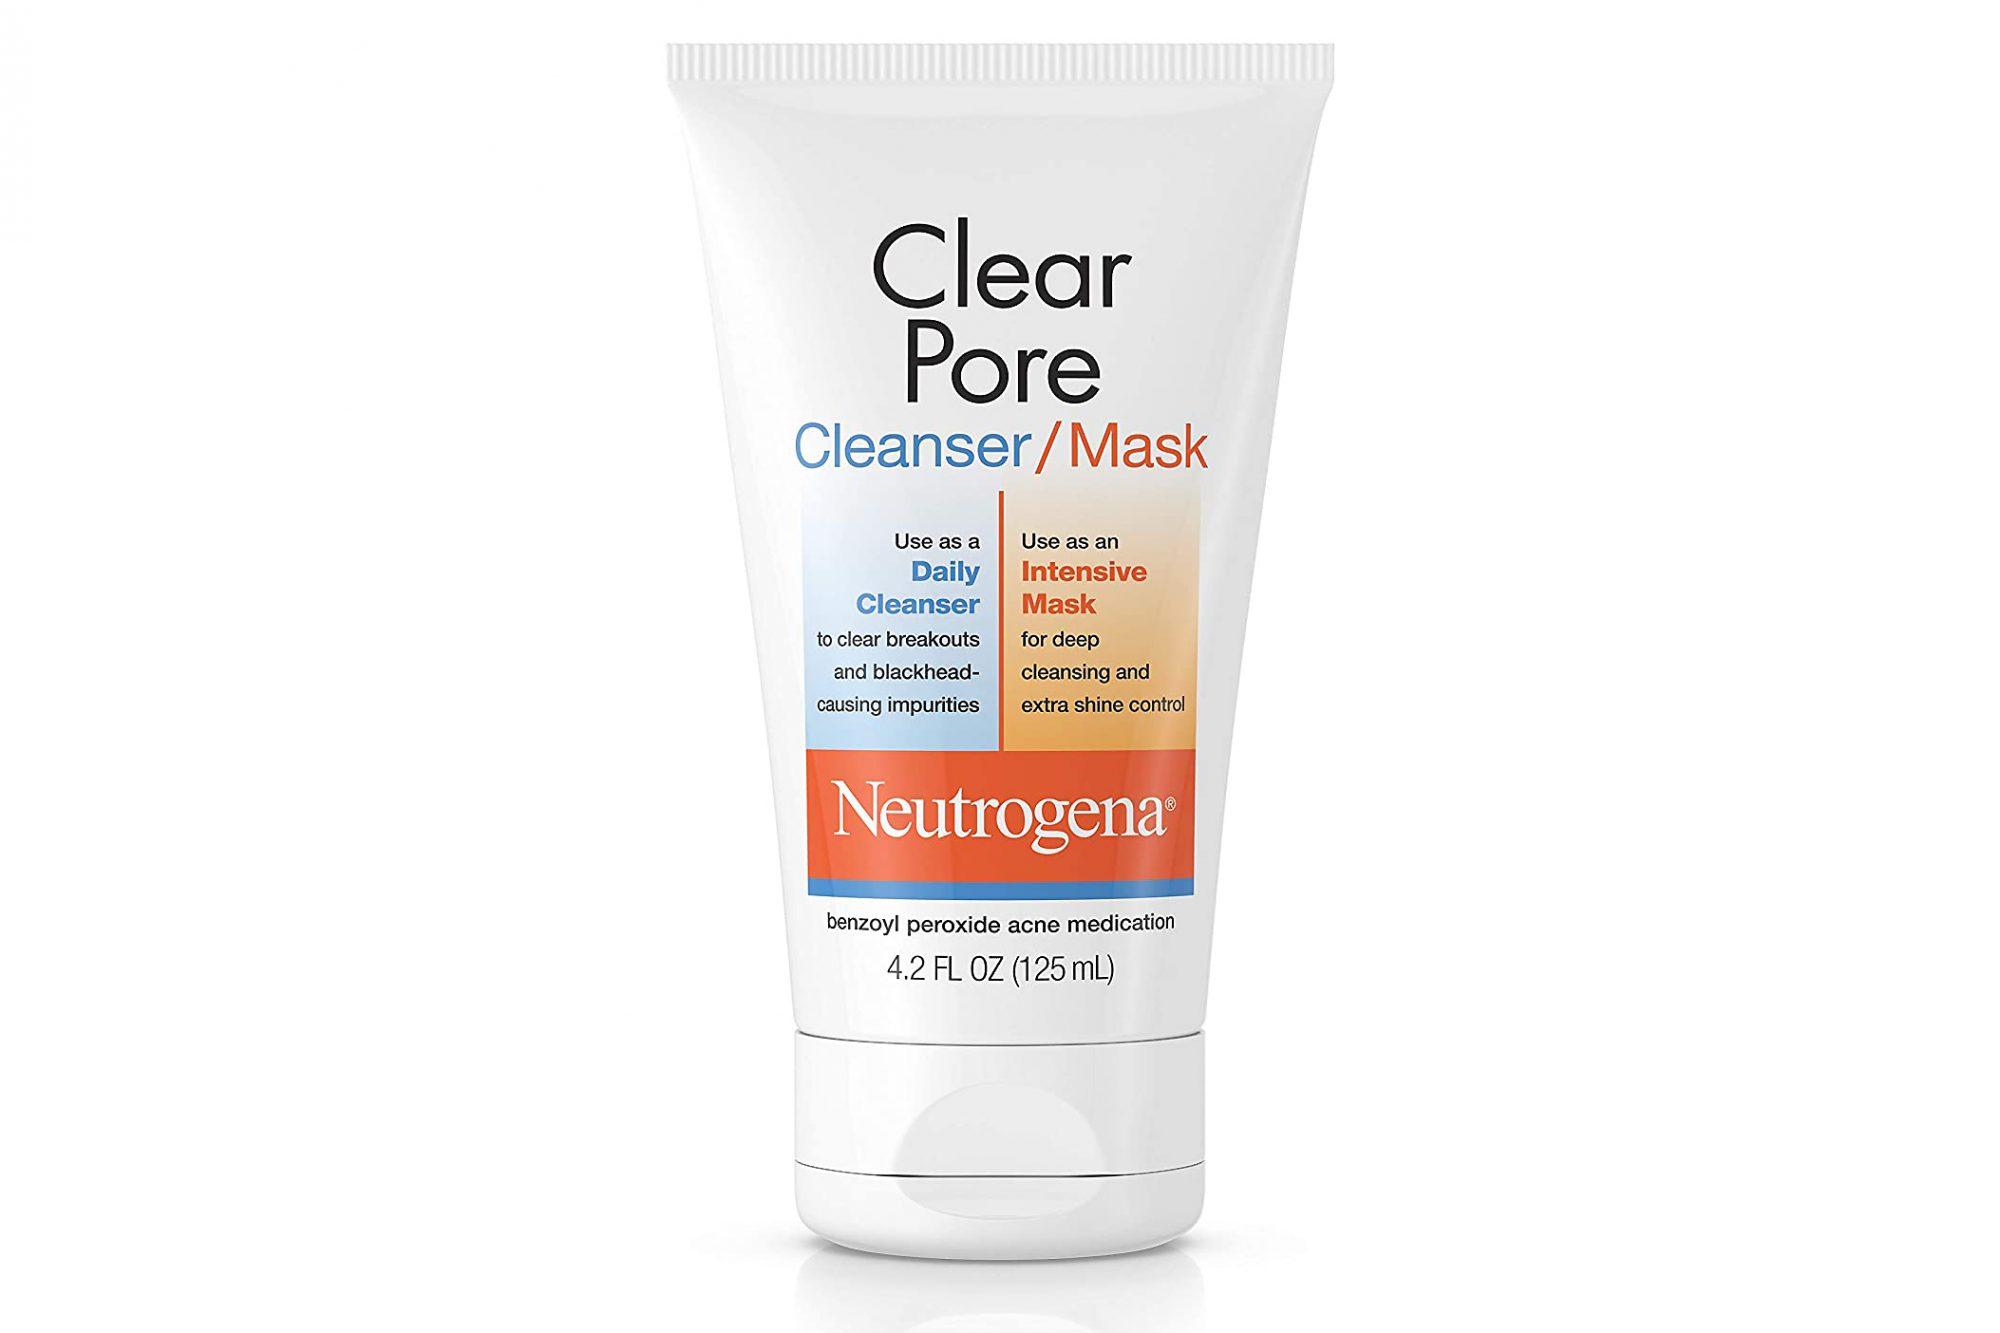 acne-cleanser-neutrogena.jpg